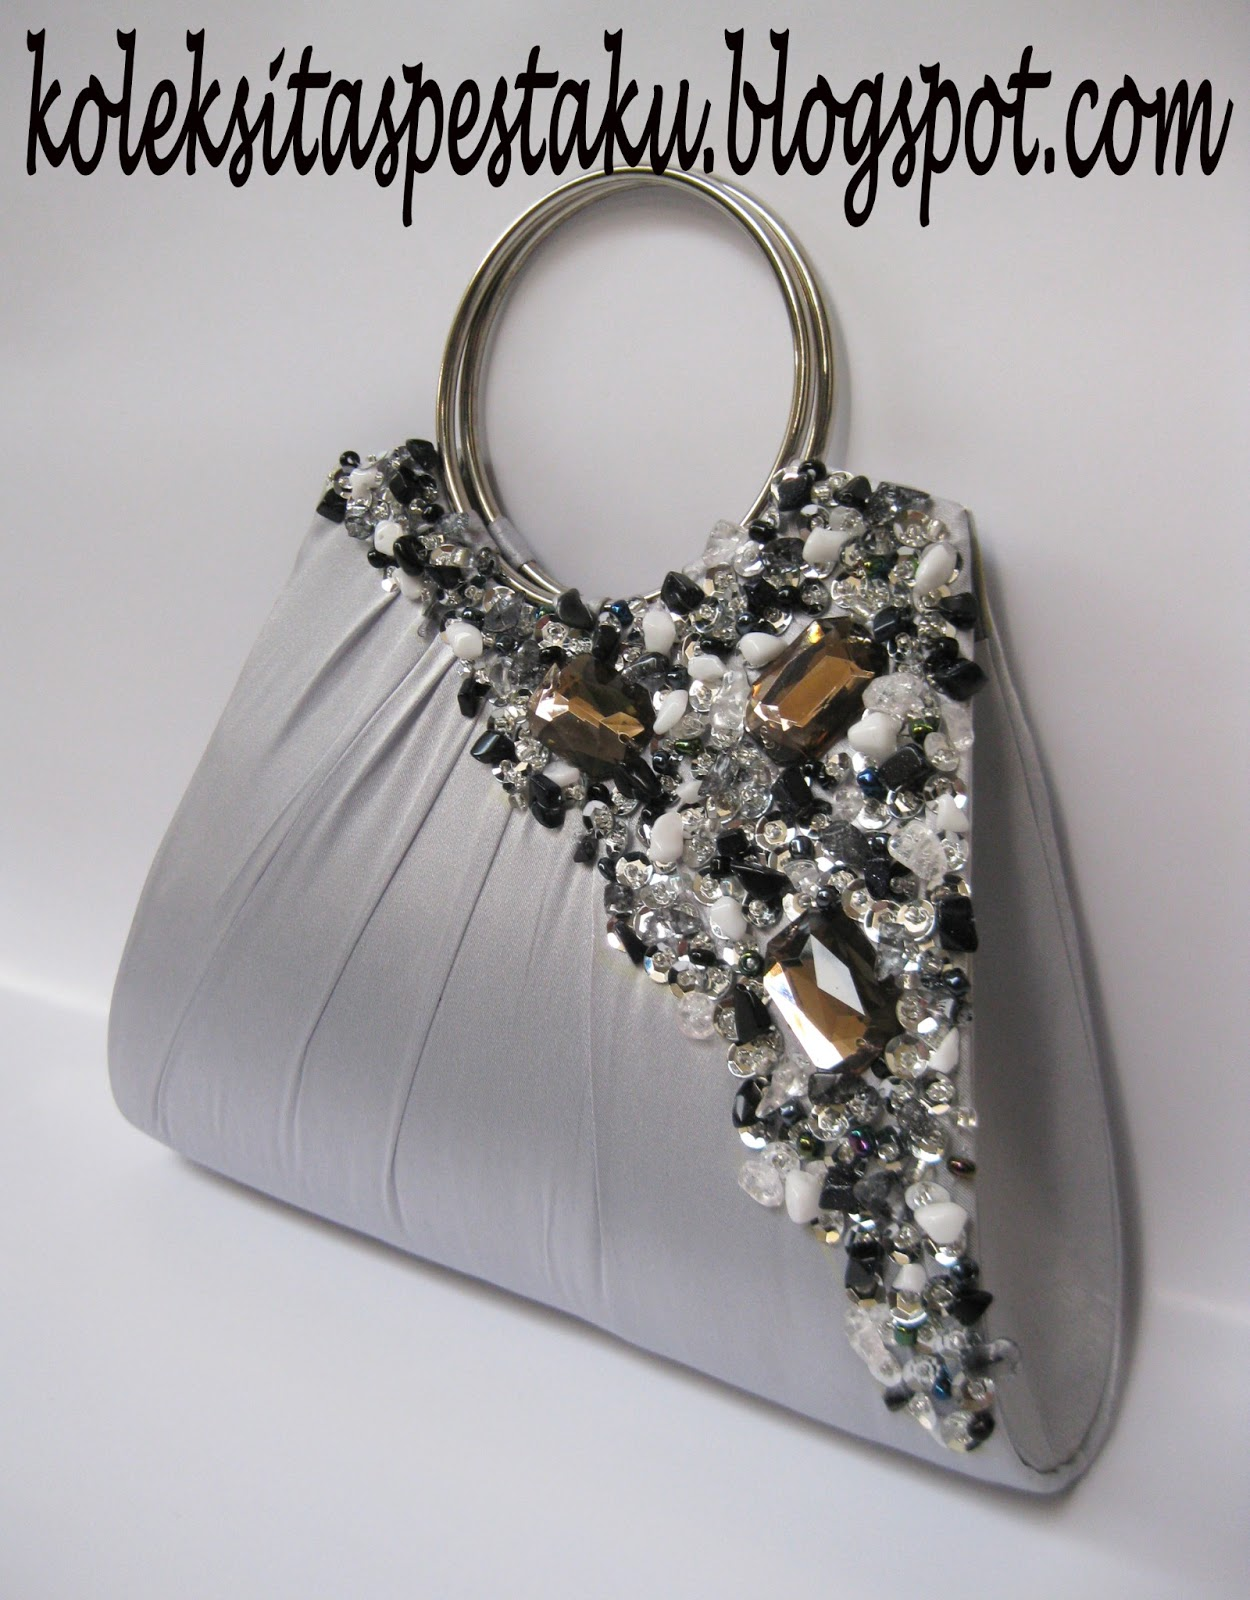 ... Clutch Bag Terbaru Bulan APril 2013 dgn Warna Silver Kode KB16 (SOLD  OUT). Terbaru Tas Pesta aa934d5daa